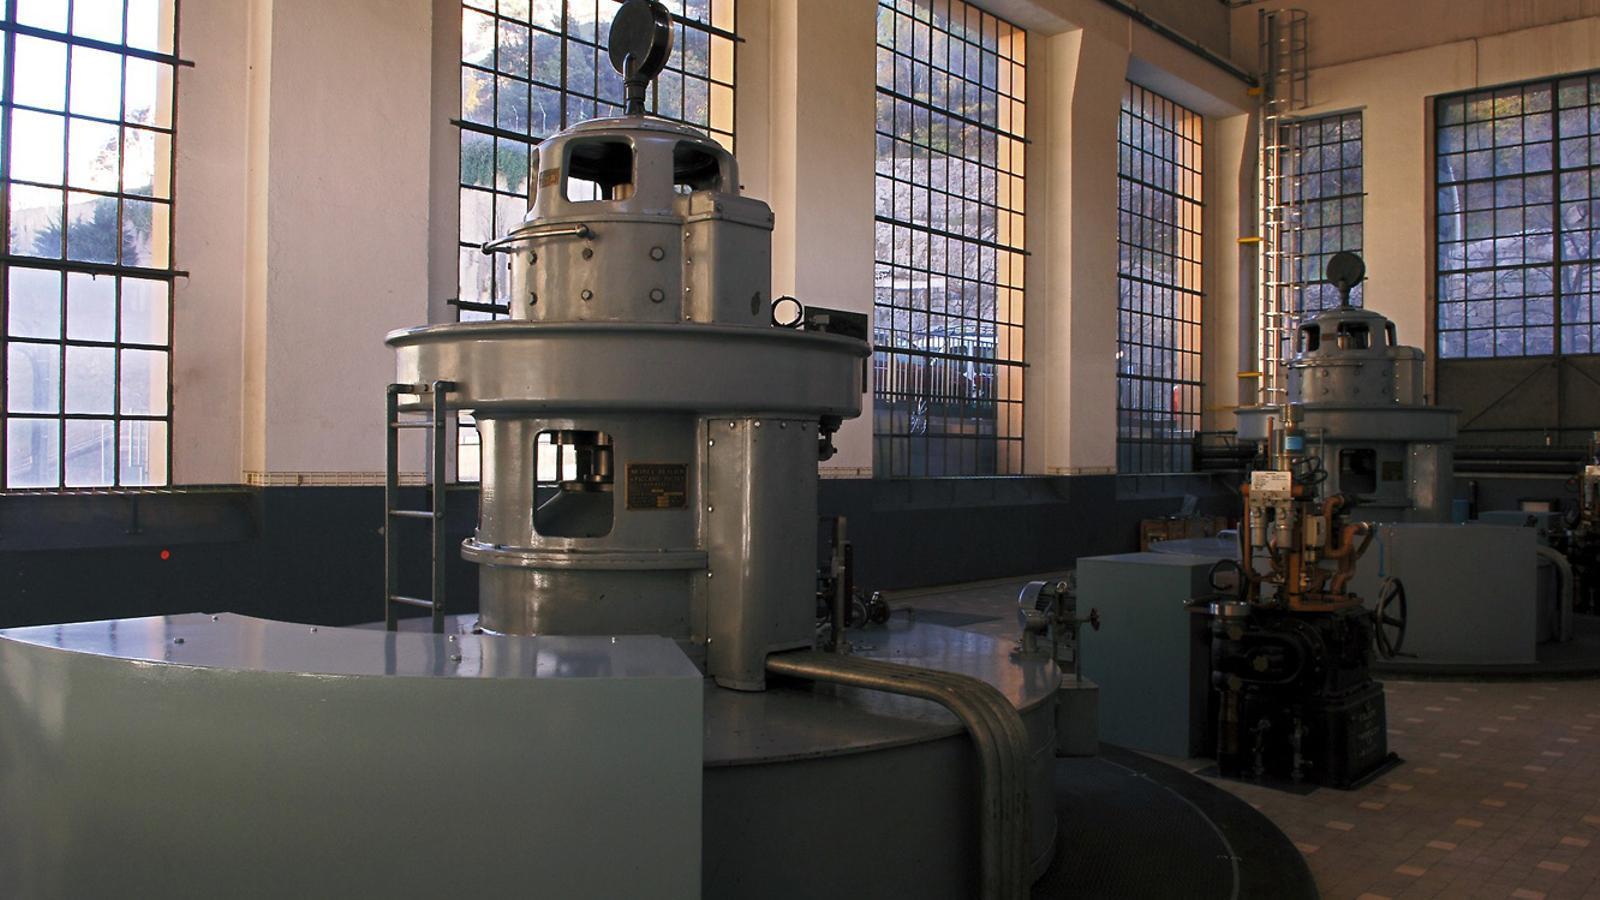 La sala de màquines de la central hidroelèctrica de FEDA. / FEDA